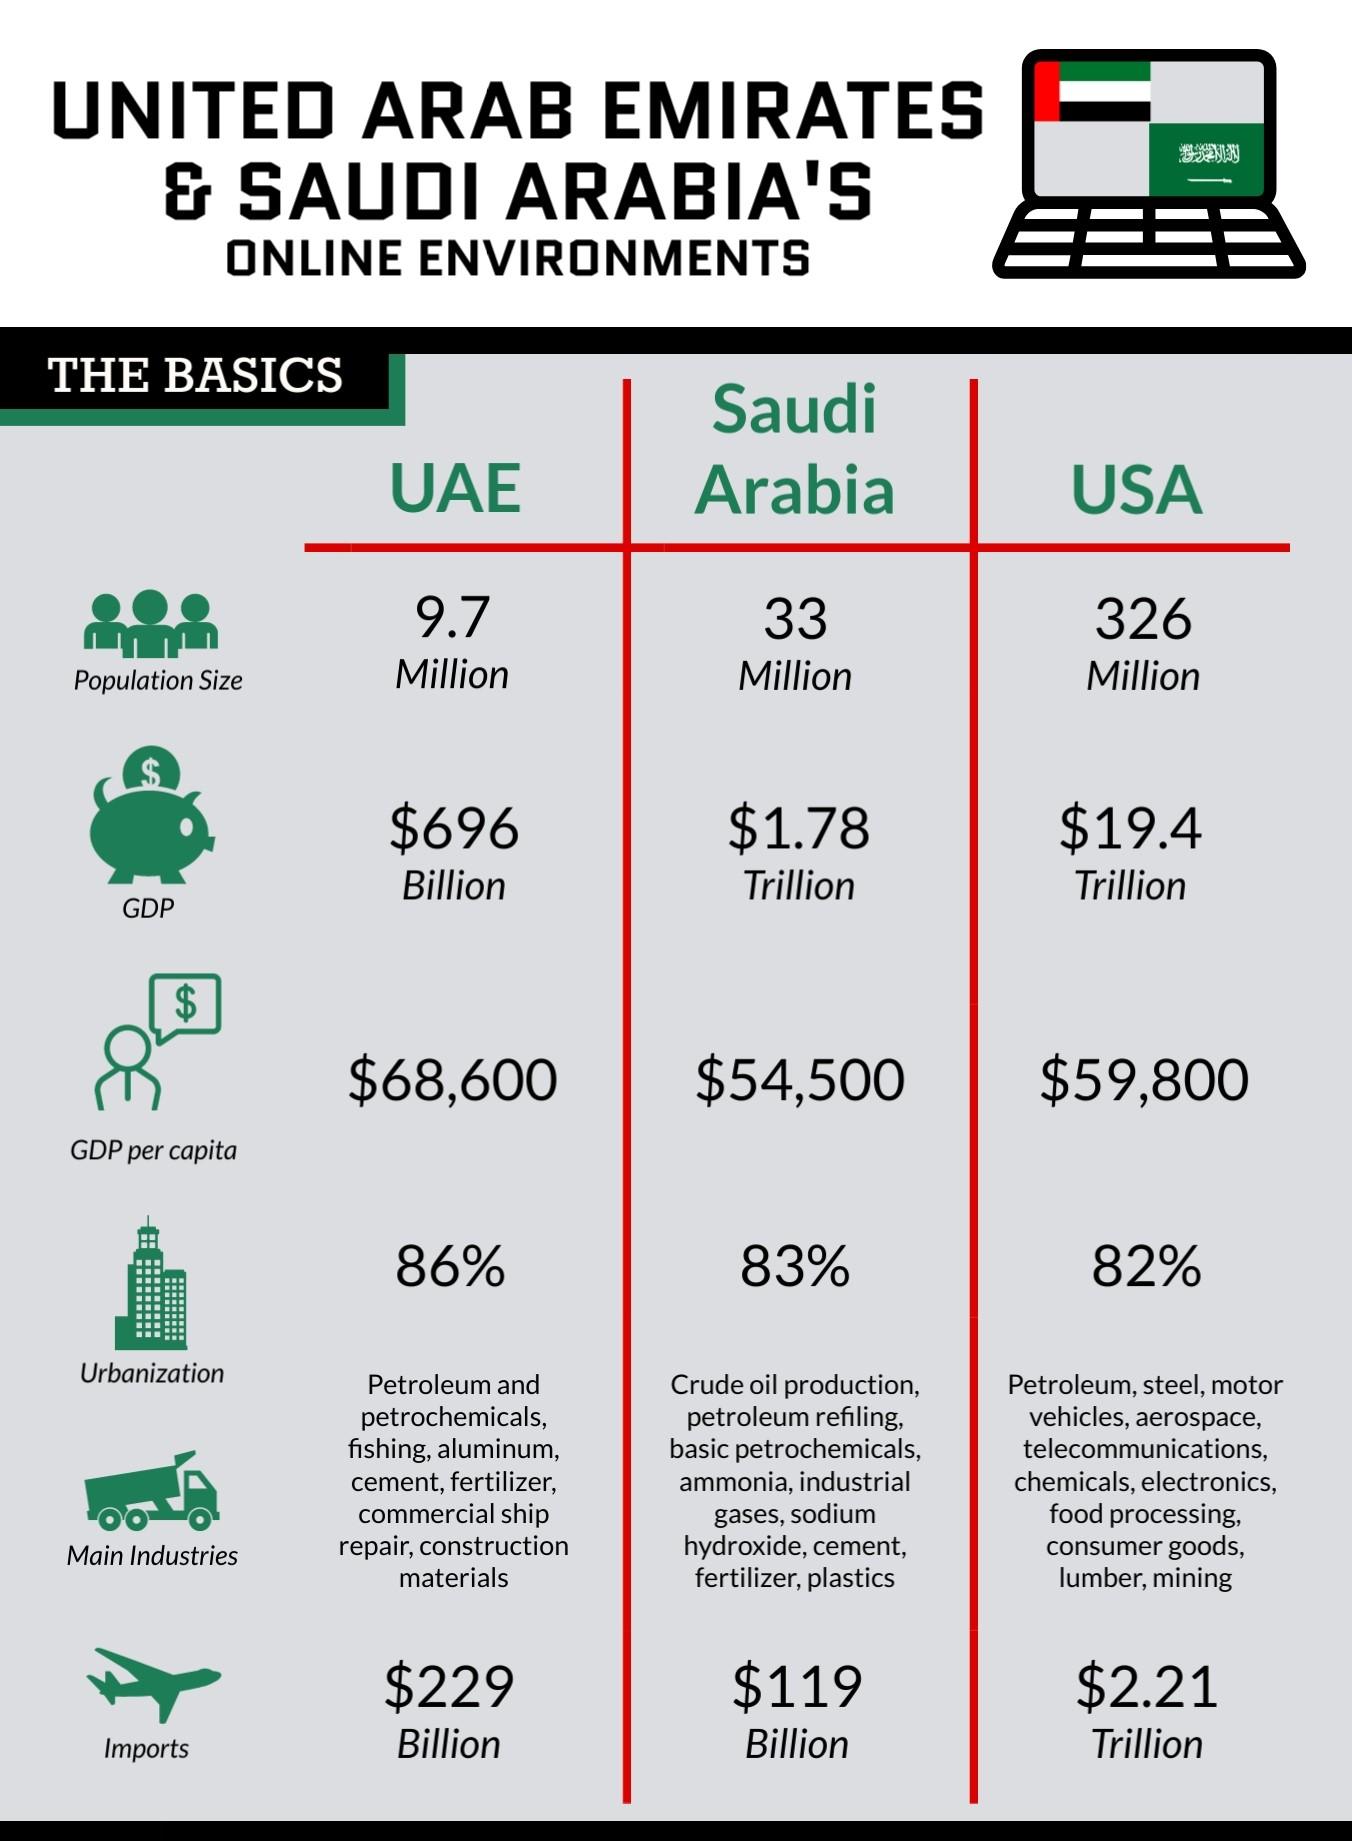 Saudi-Arabia-UAEs-Online-Environments